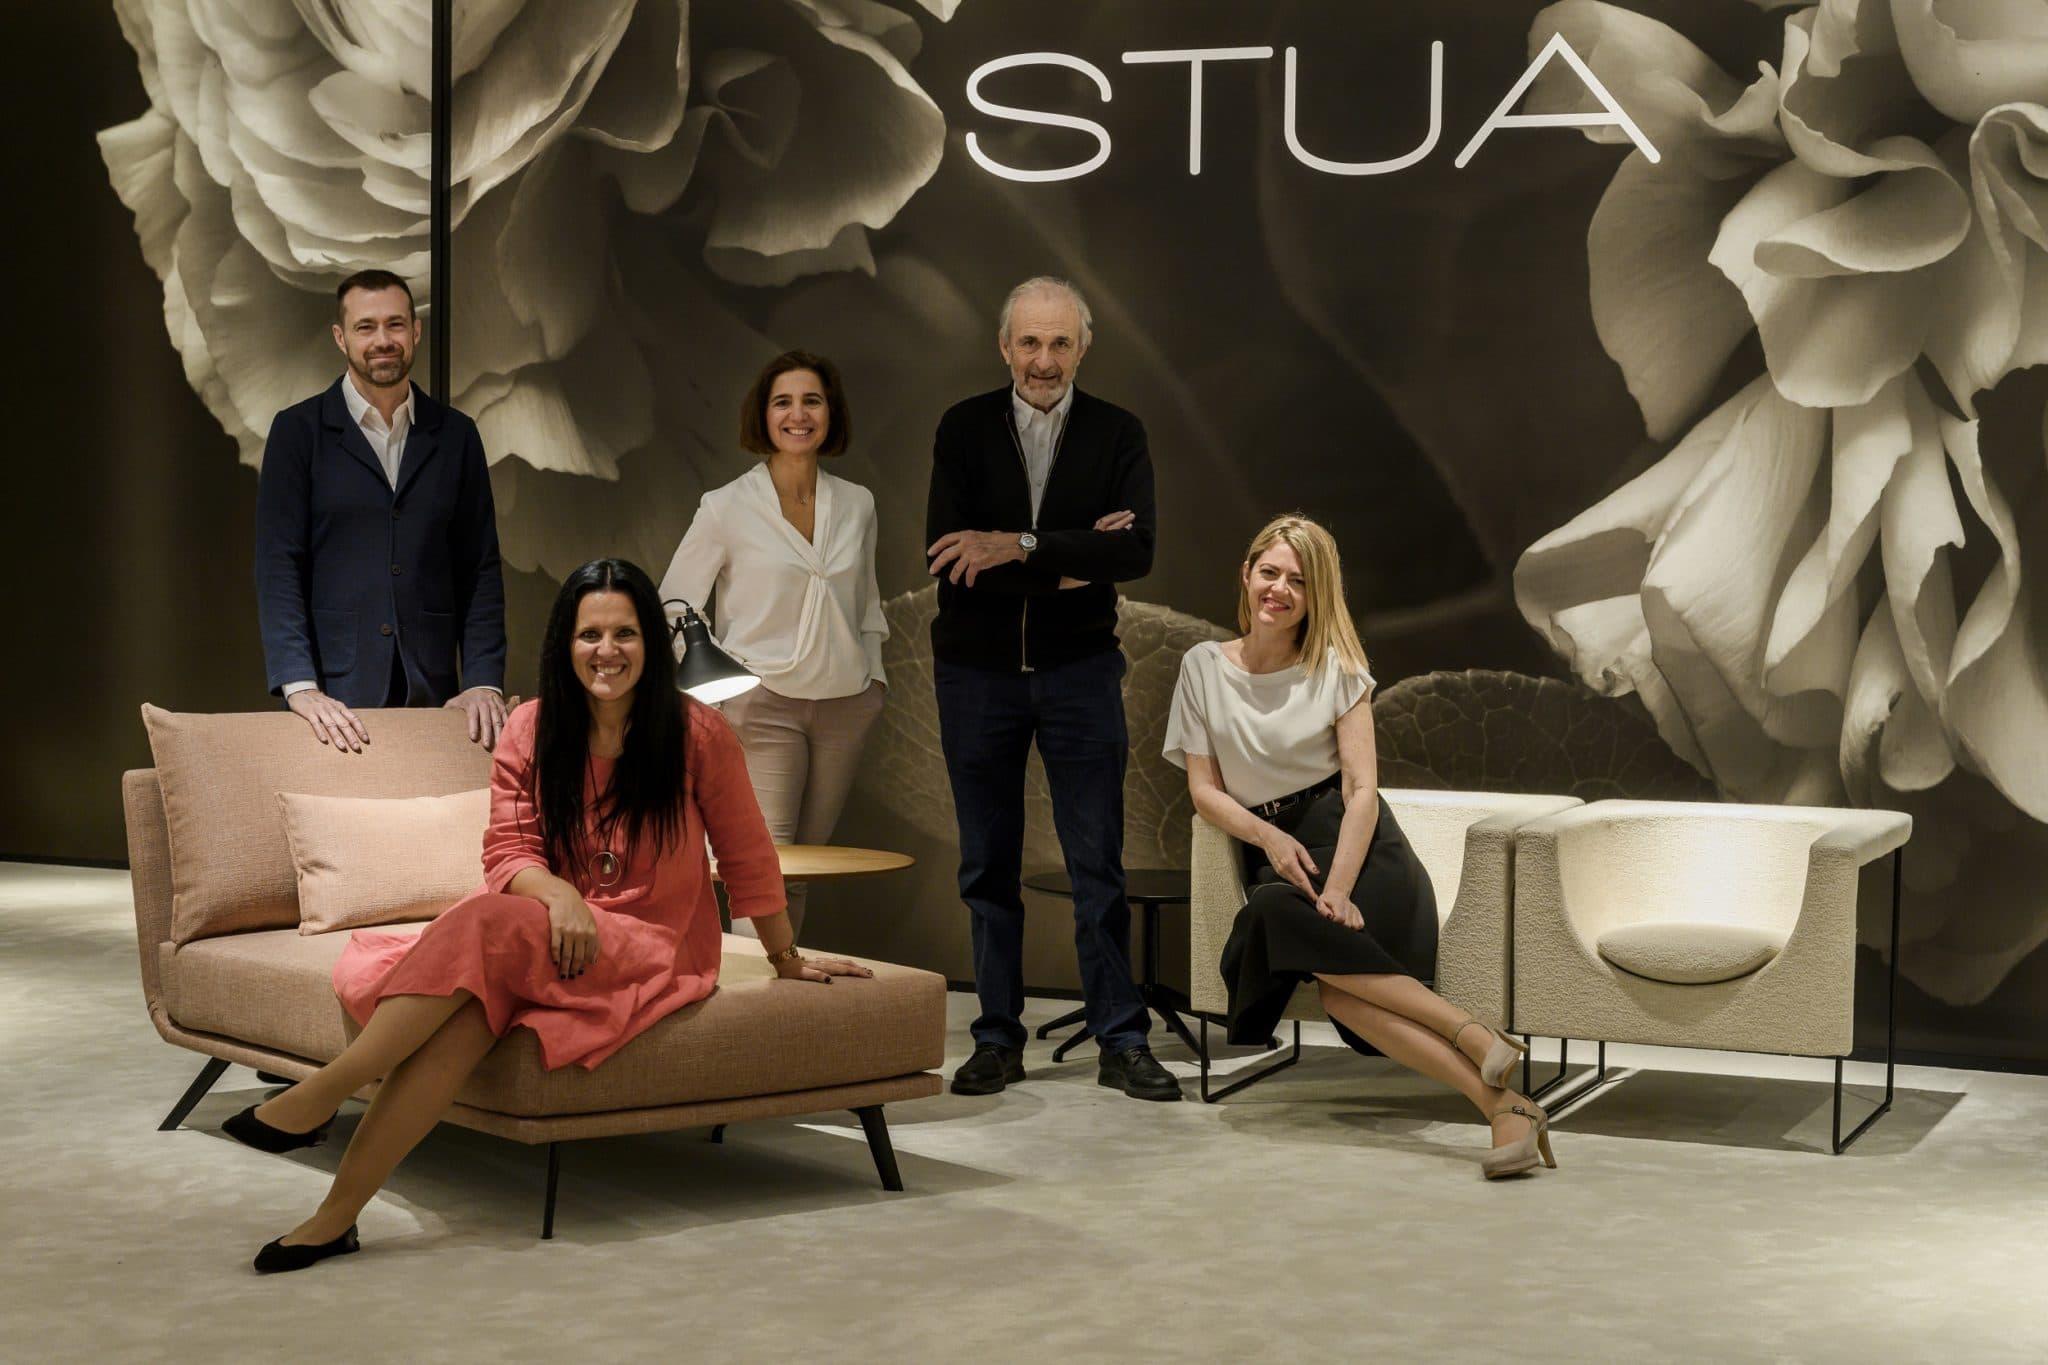 STUA team